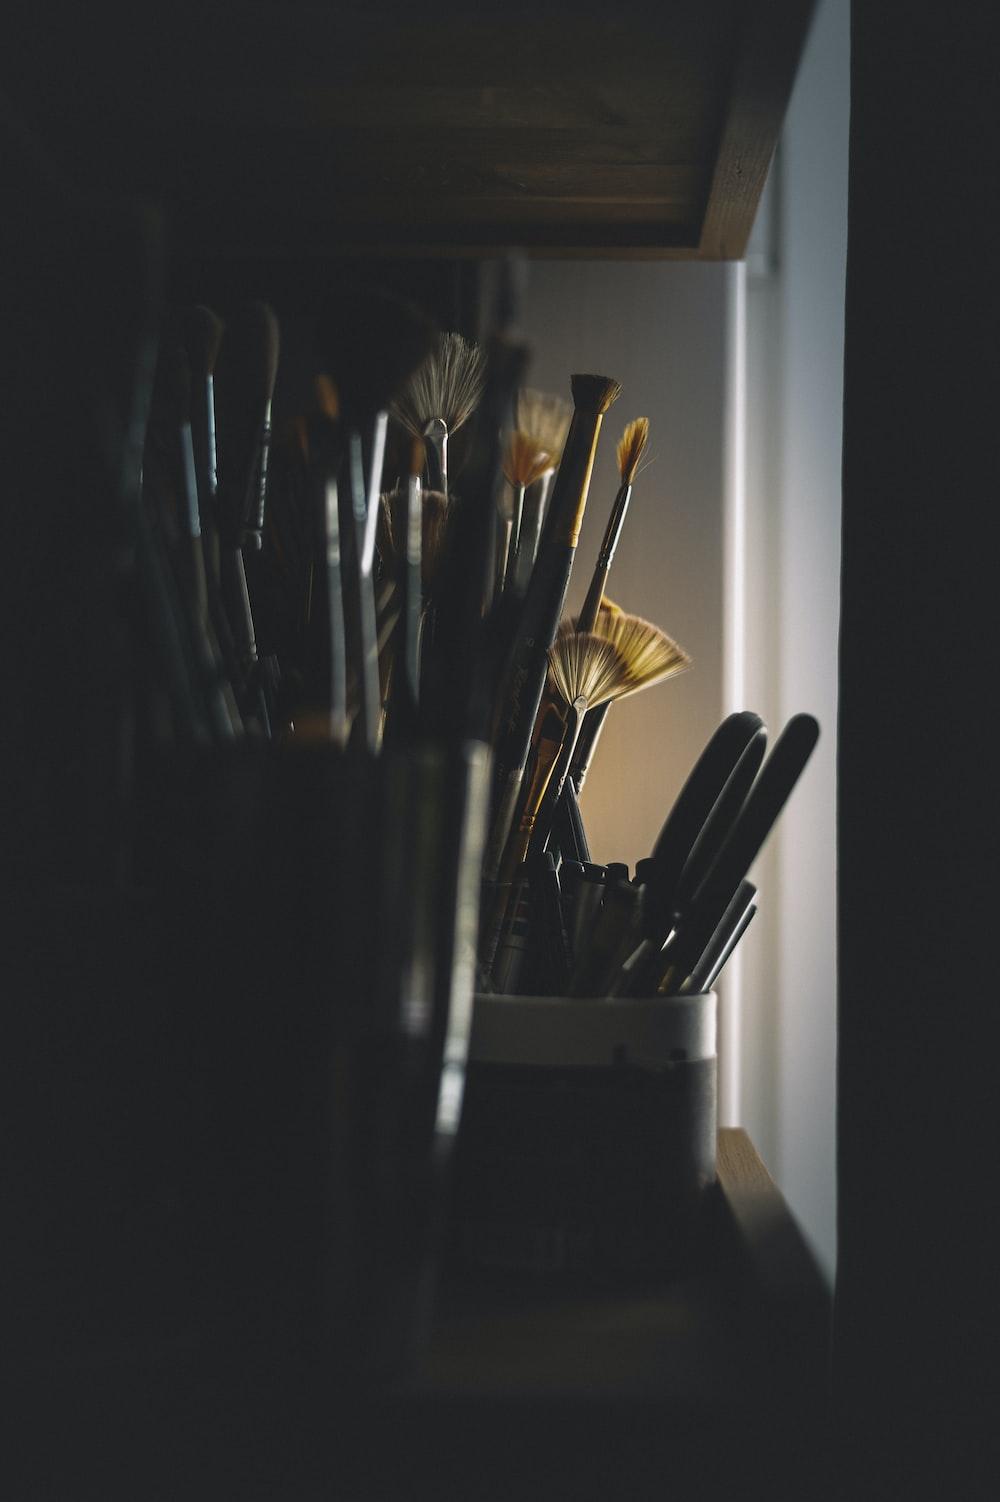 black and white paint brush set